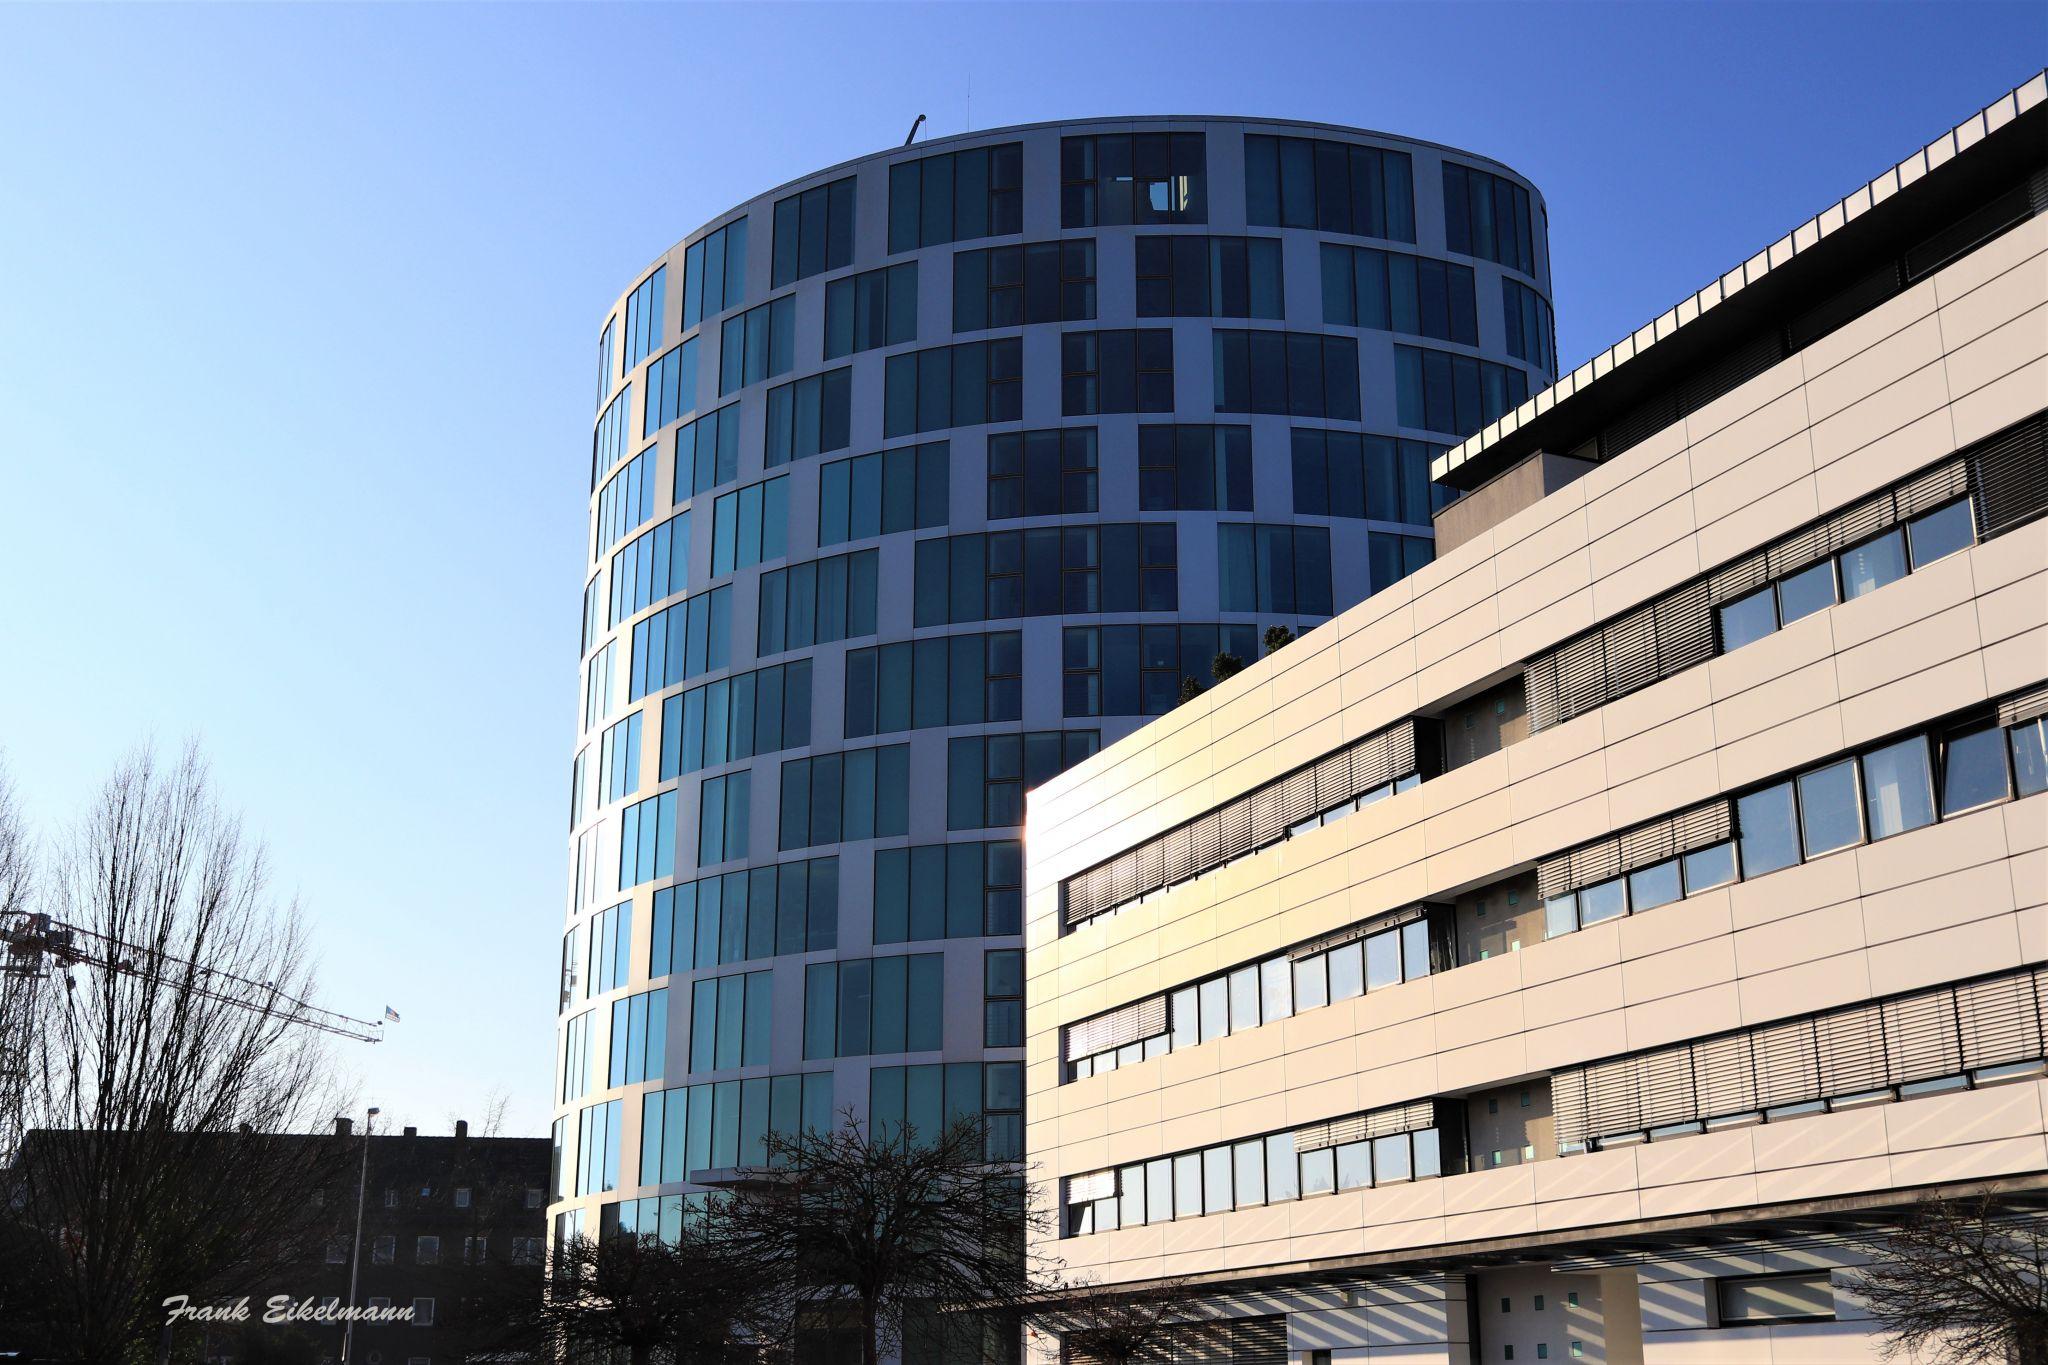 ZEB Büroturm, Germany